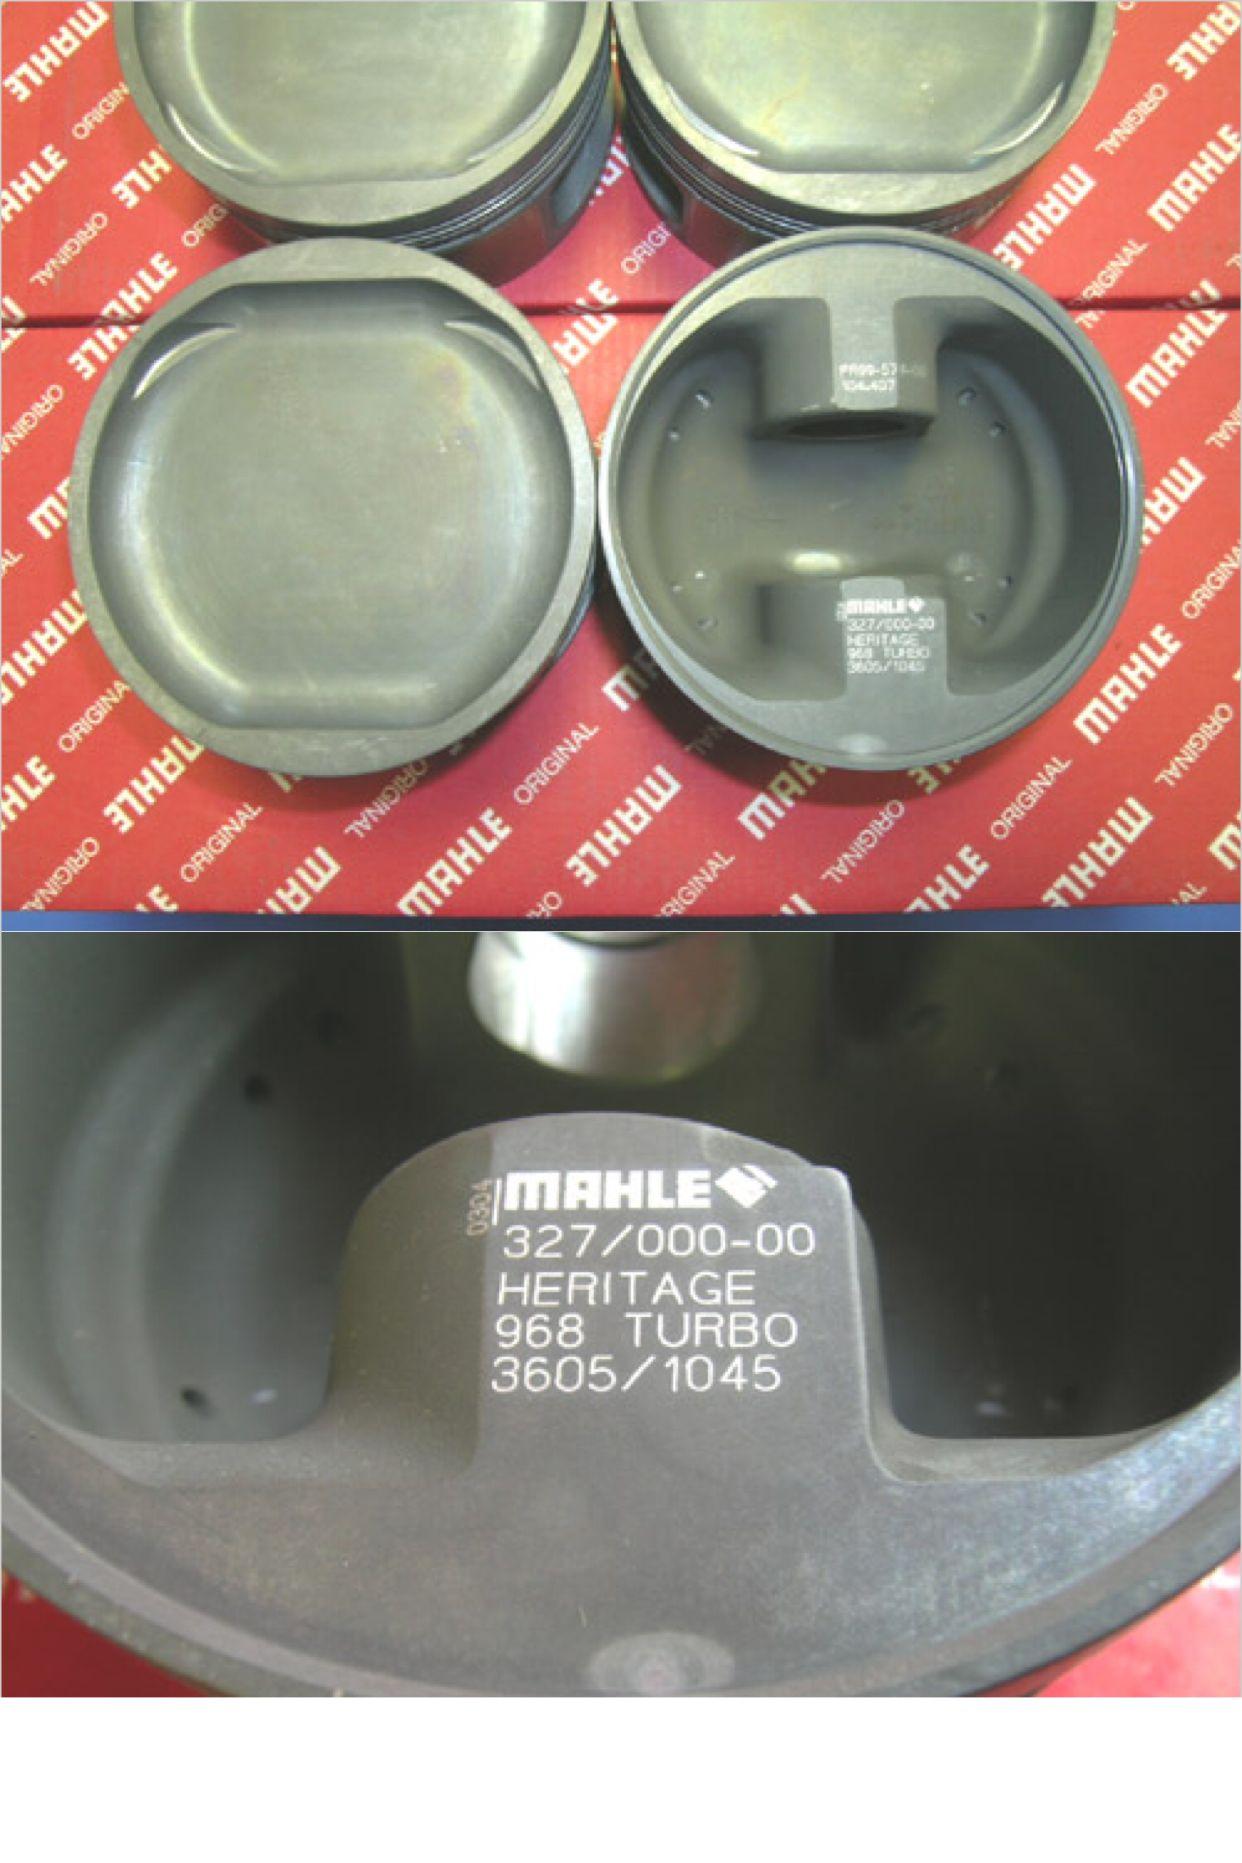 HMR/MAHLE Porsche 968 16v turbo piston, forged 104 50mm 8 5